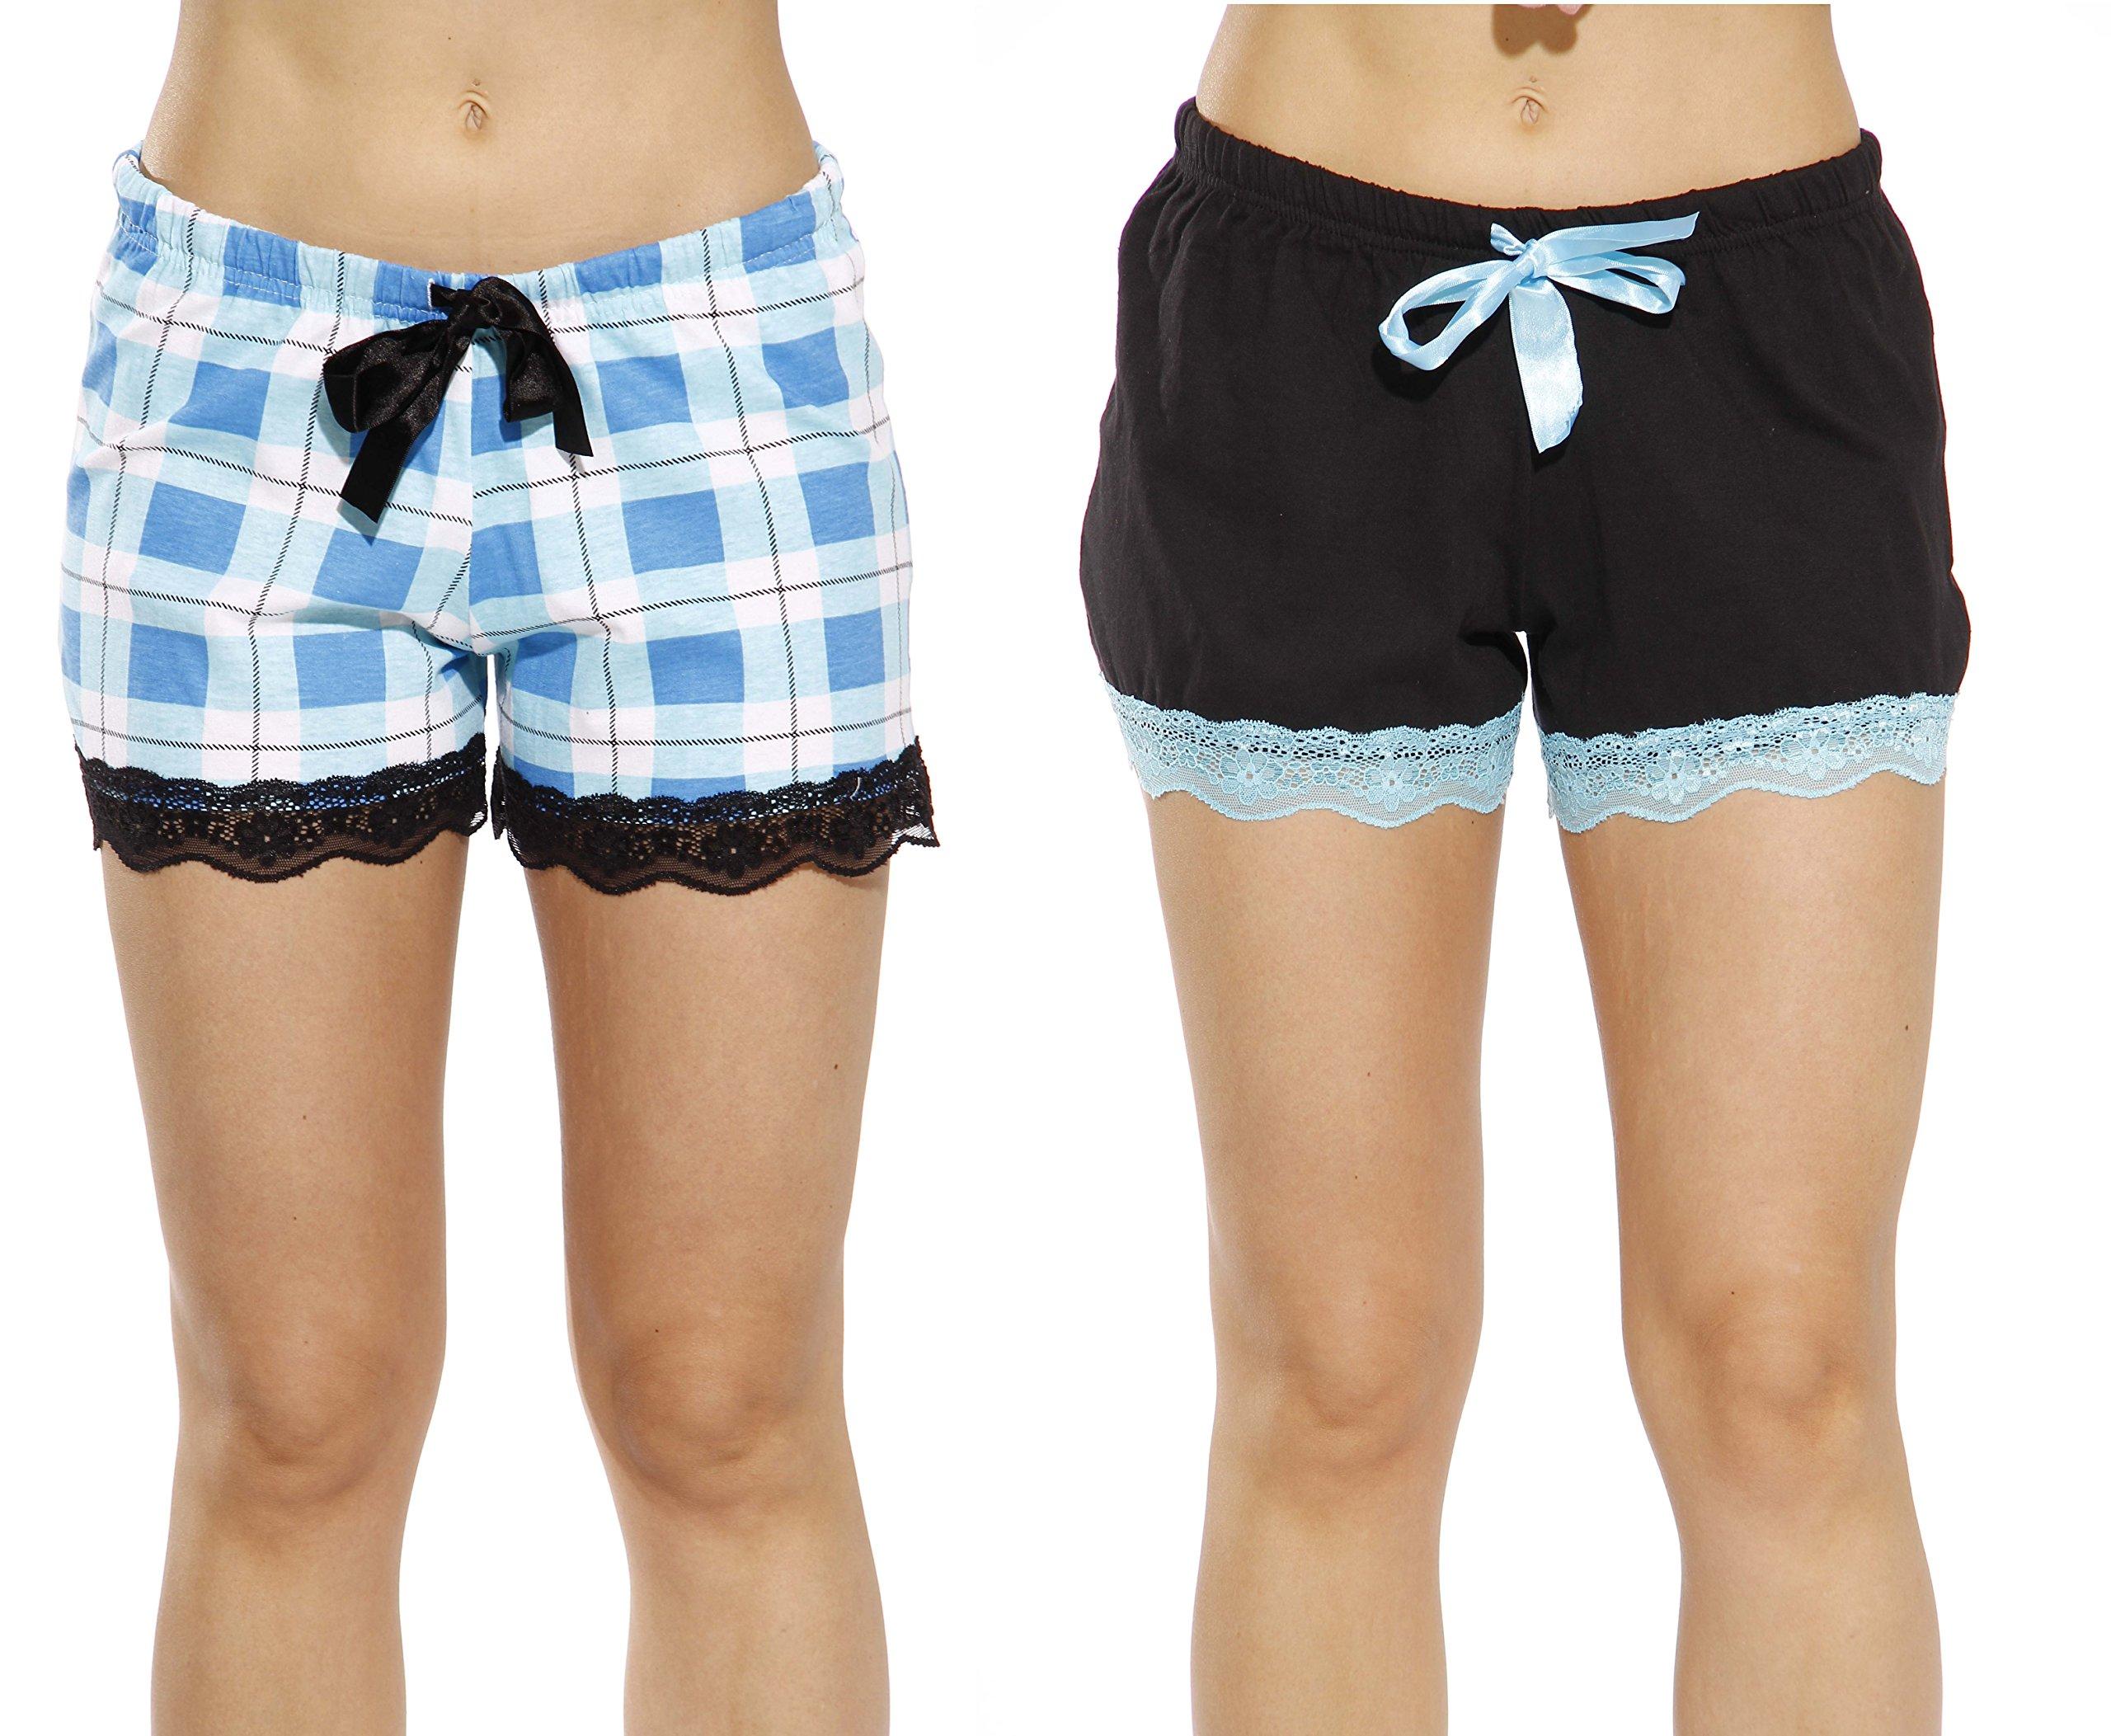 6334-10019-XL Just Love Womans Pajamas Shorts - PJs - Sleepwear (Pack of 2),Black - Aqua Plaid (Pack of 2),X-Large